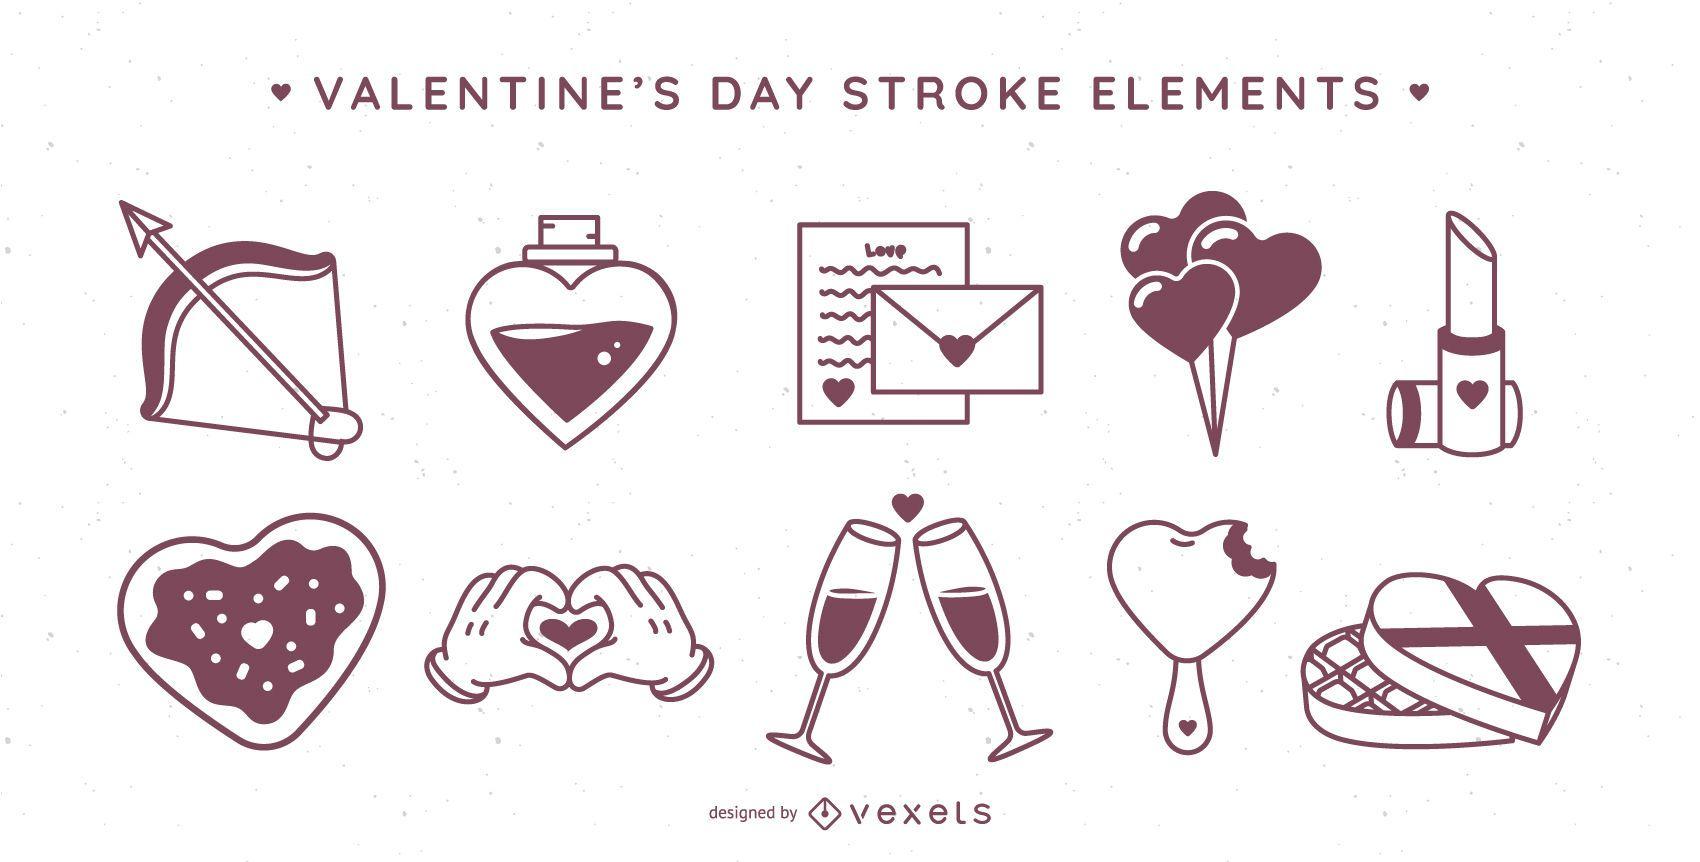 Valentine's day stroke elements set